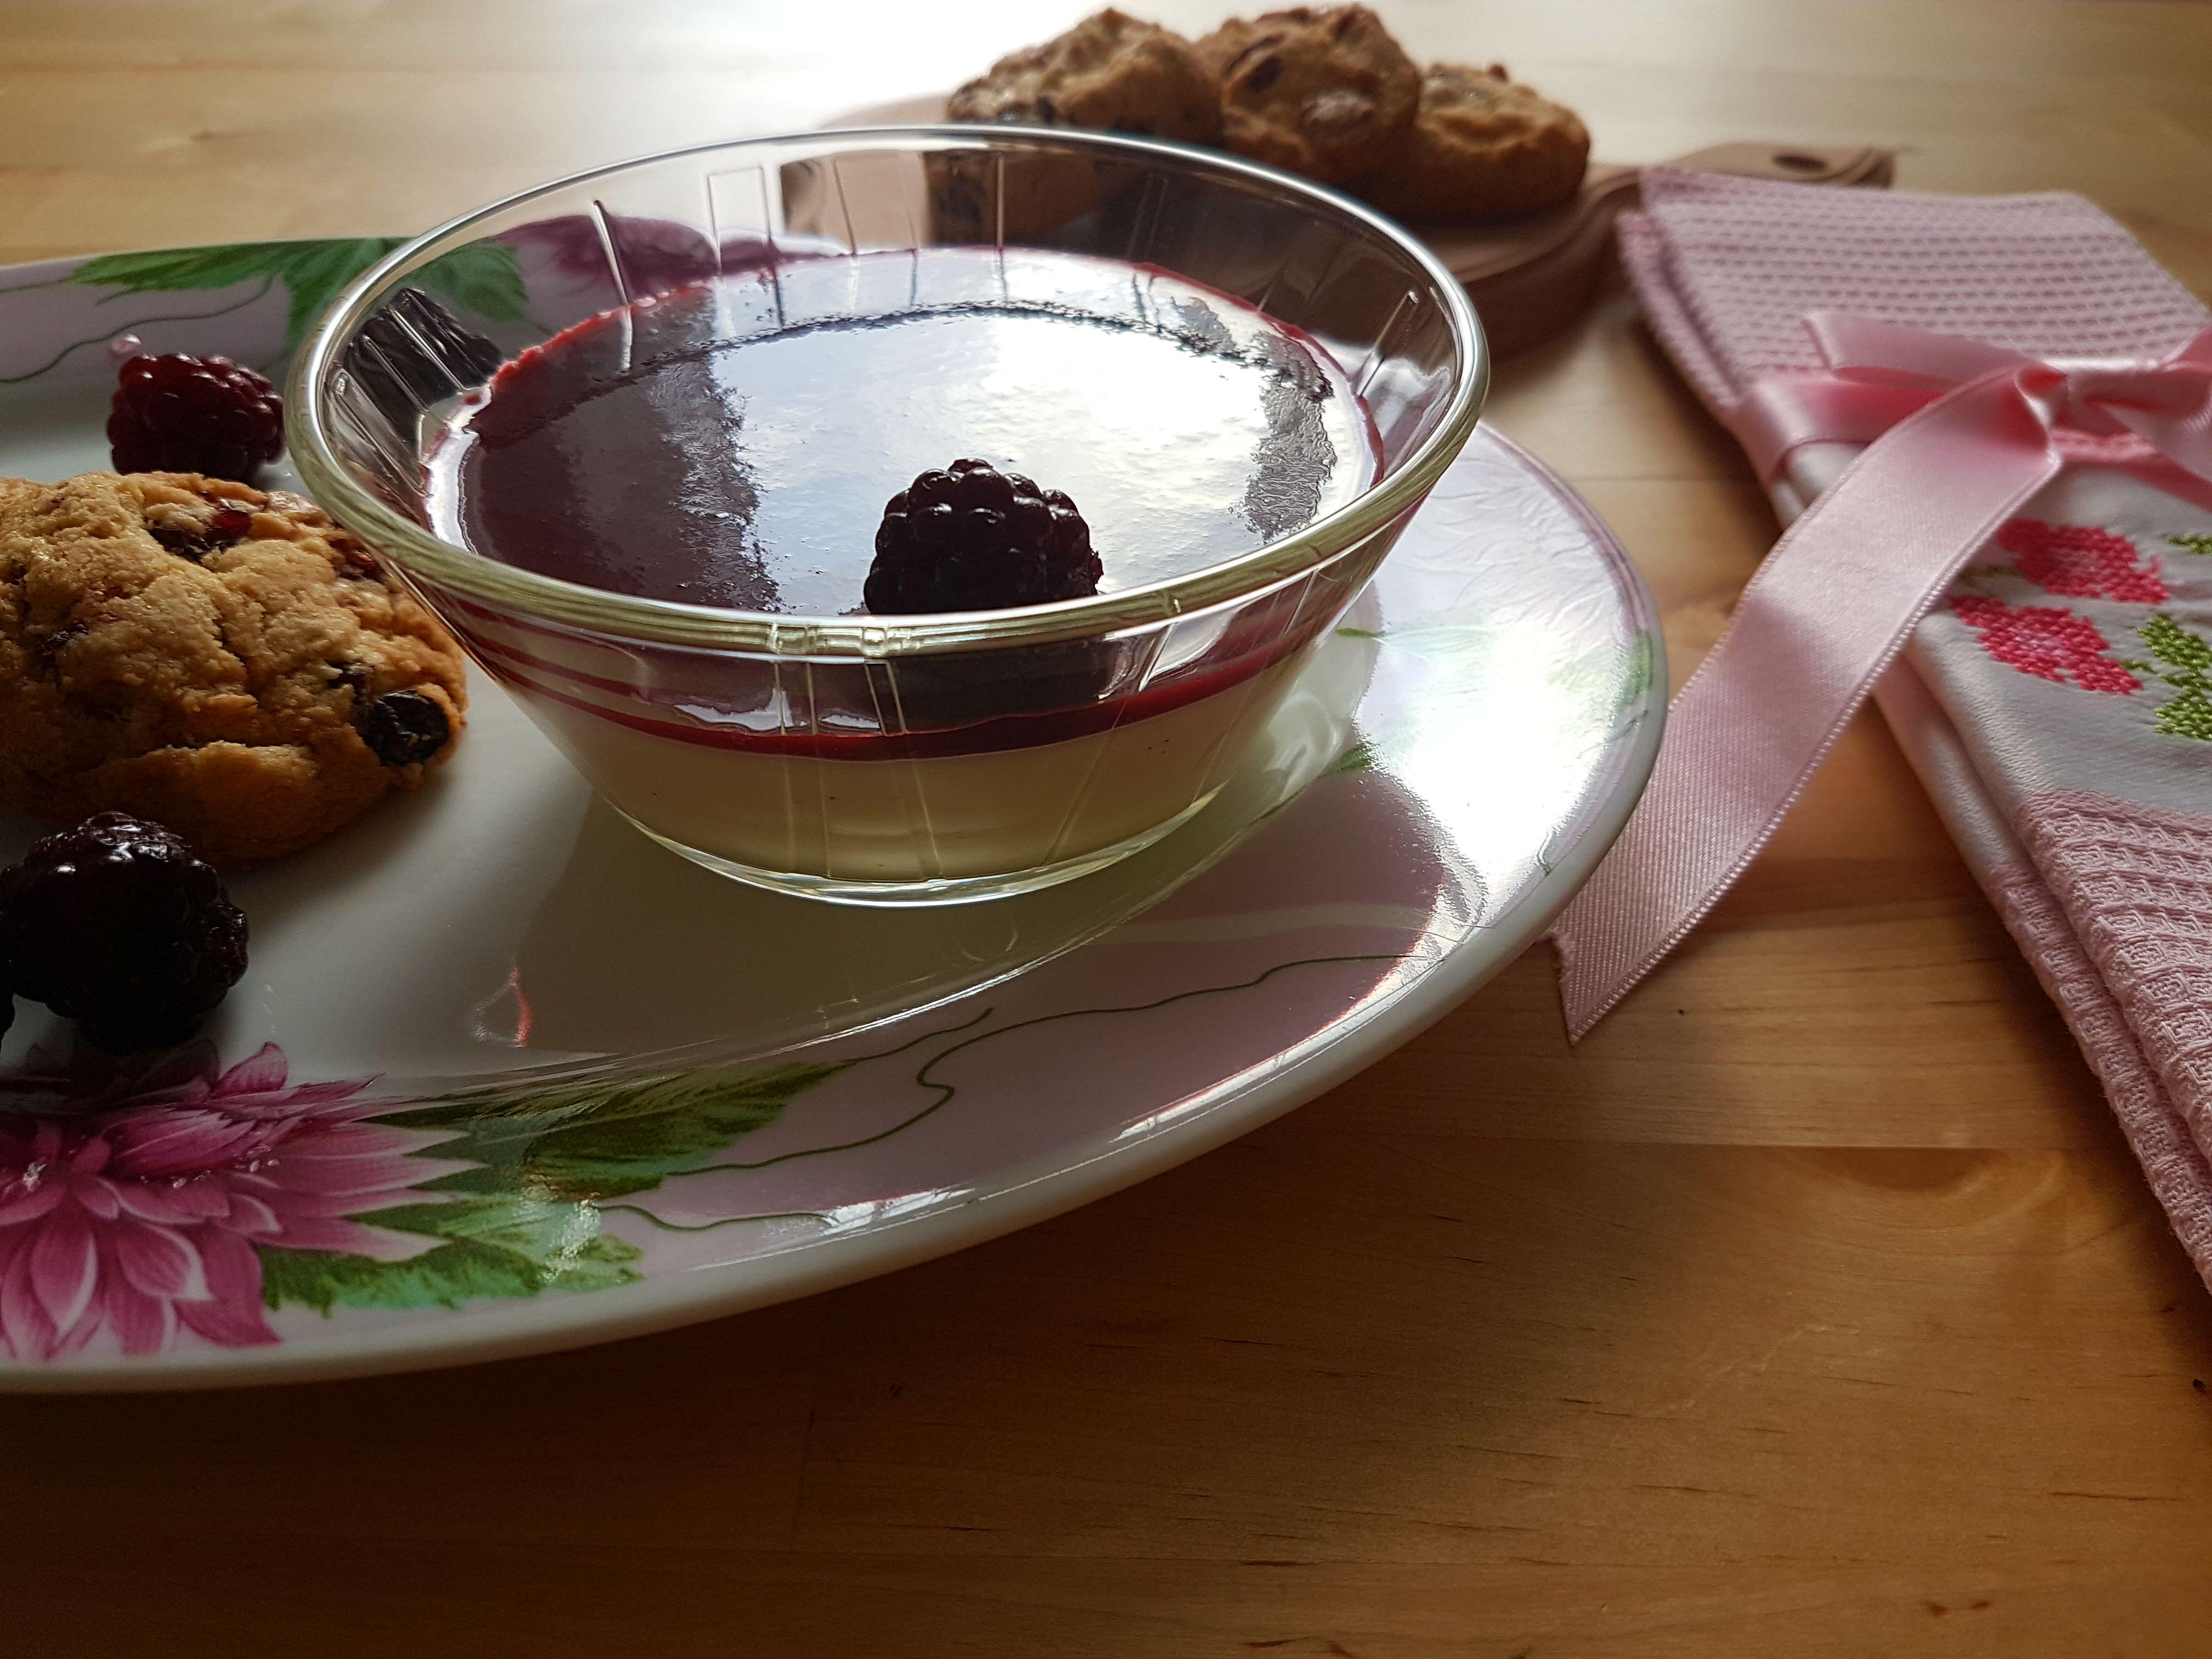 Pannacotta With White Chocolate and Berries